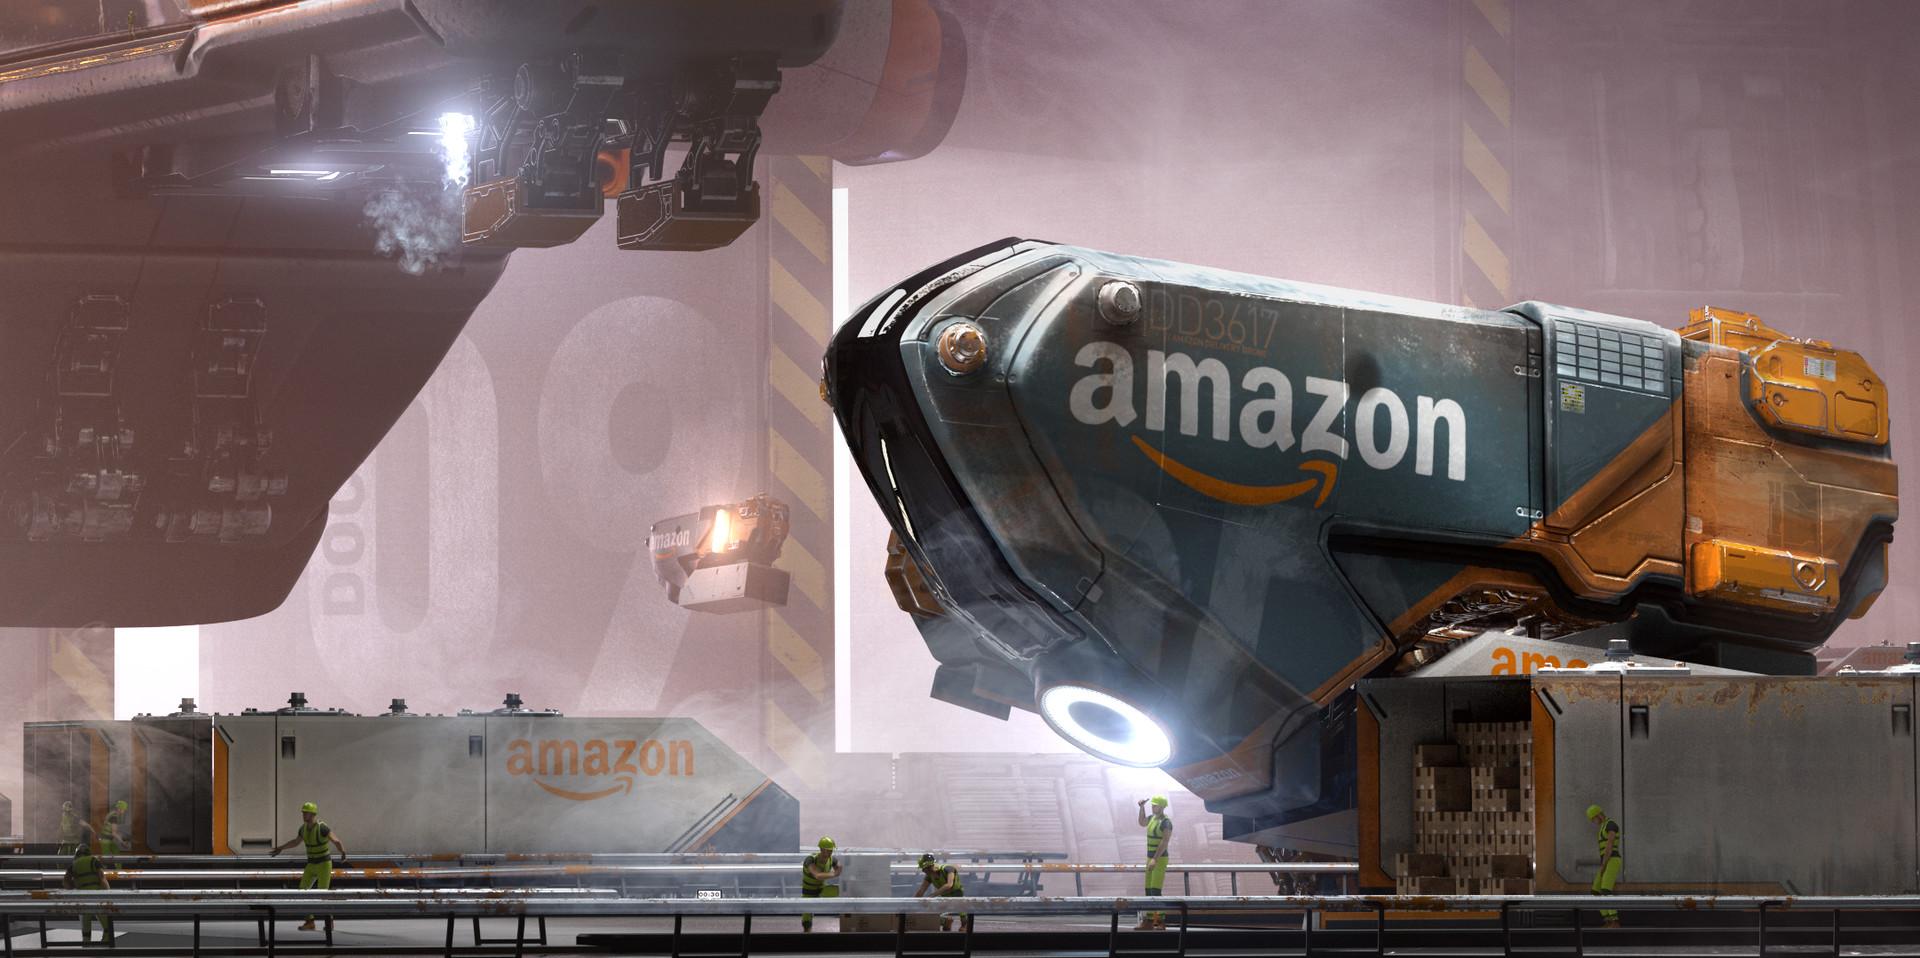 Amazon Loading Dock Concept Art by Daniel Balzer